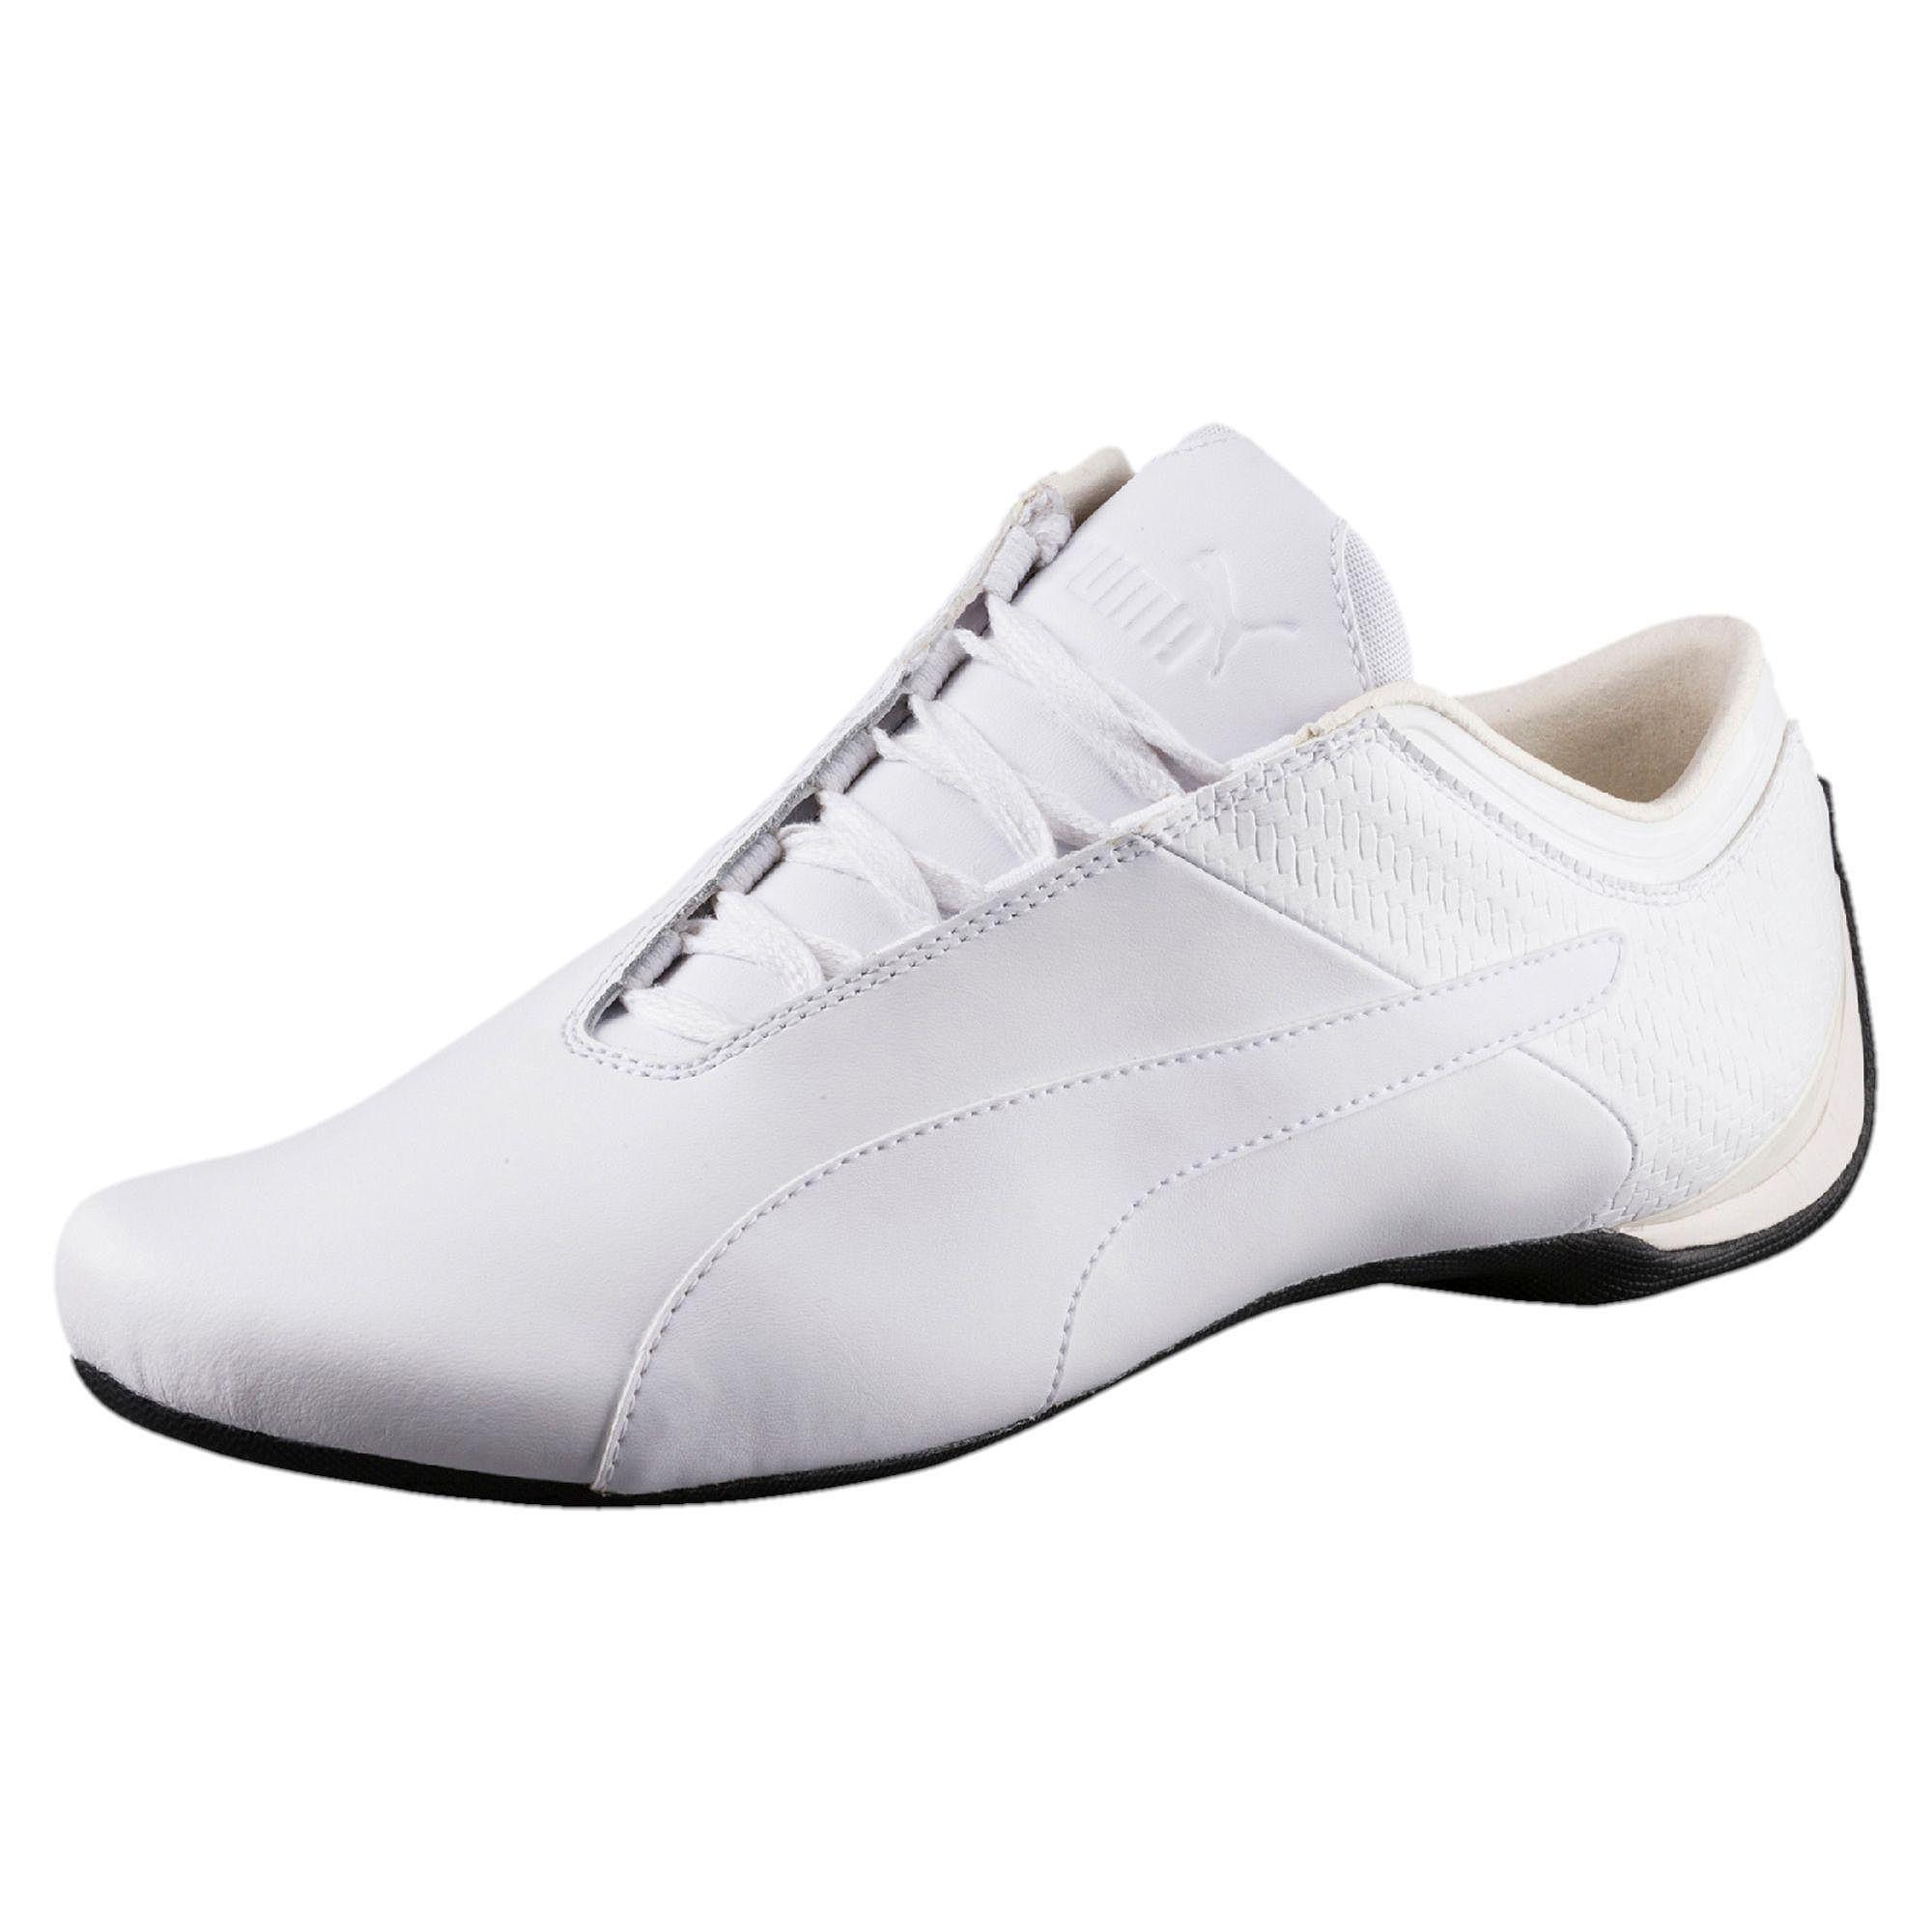 chaussures puma blanche homme